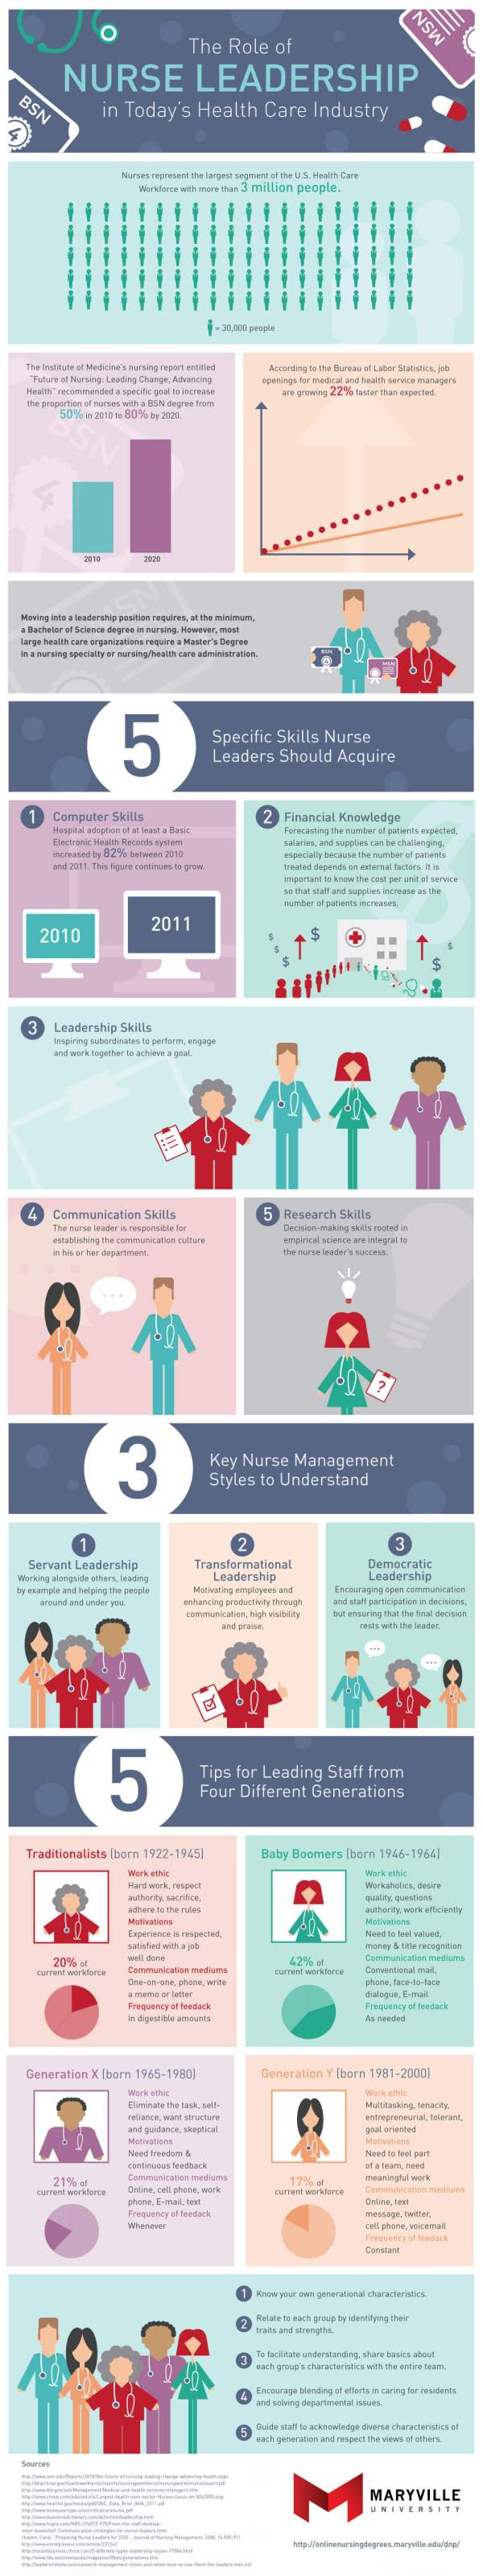 MVU-IG_Role-of-Nurse-Leadership_infographic-galleryr